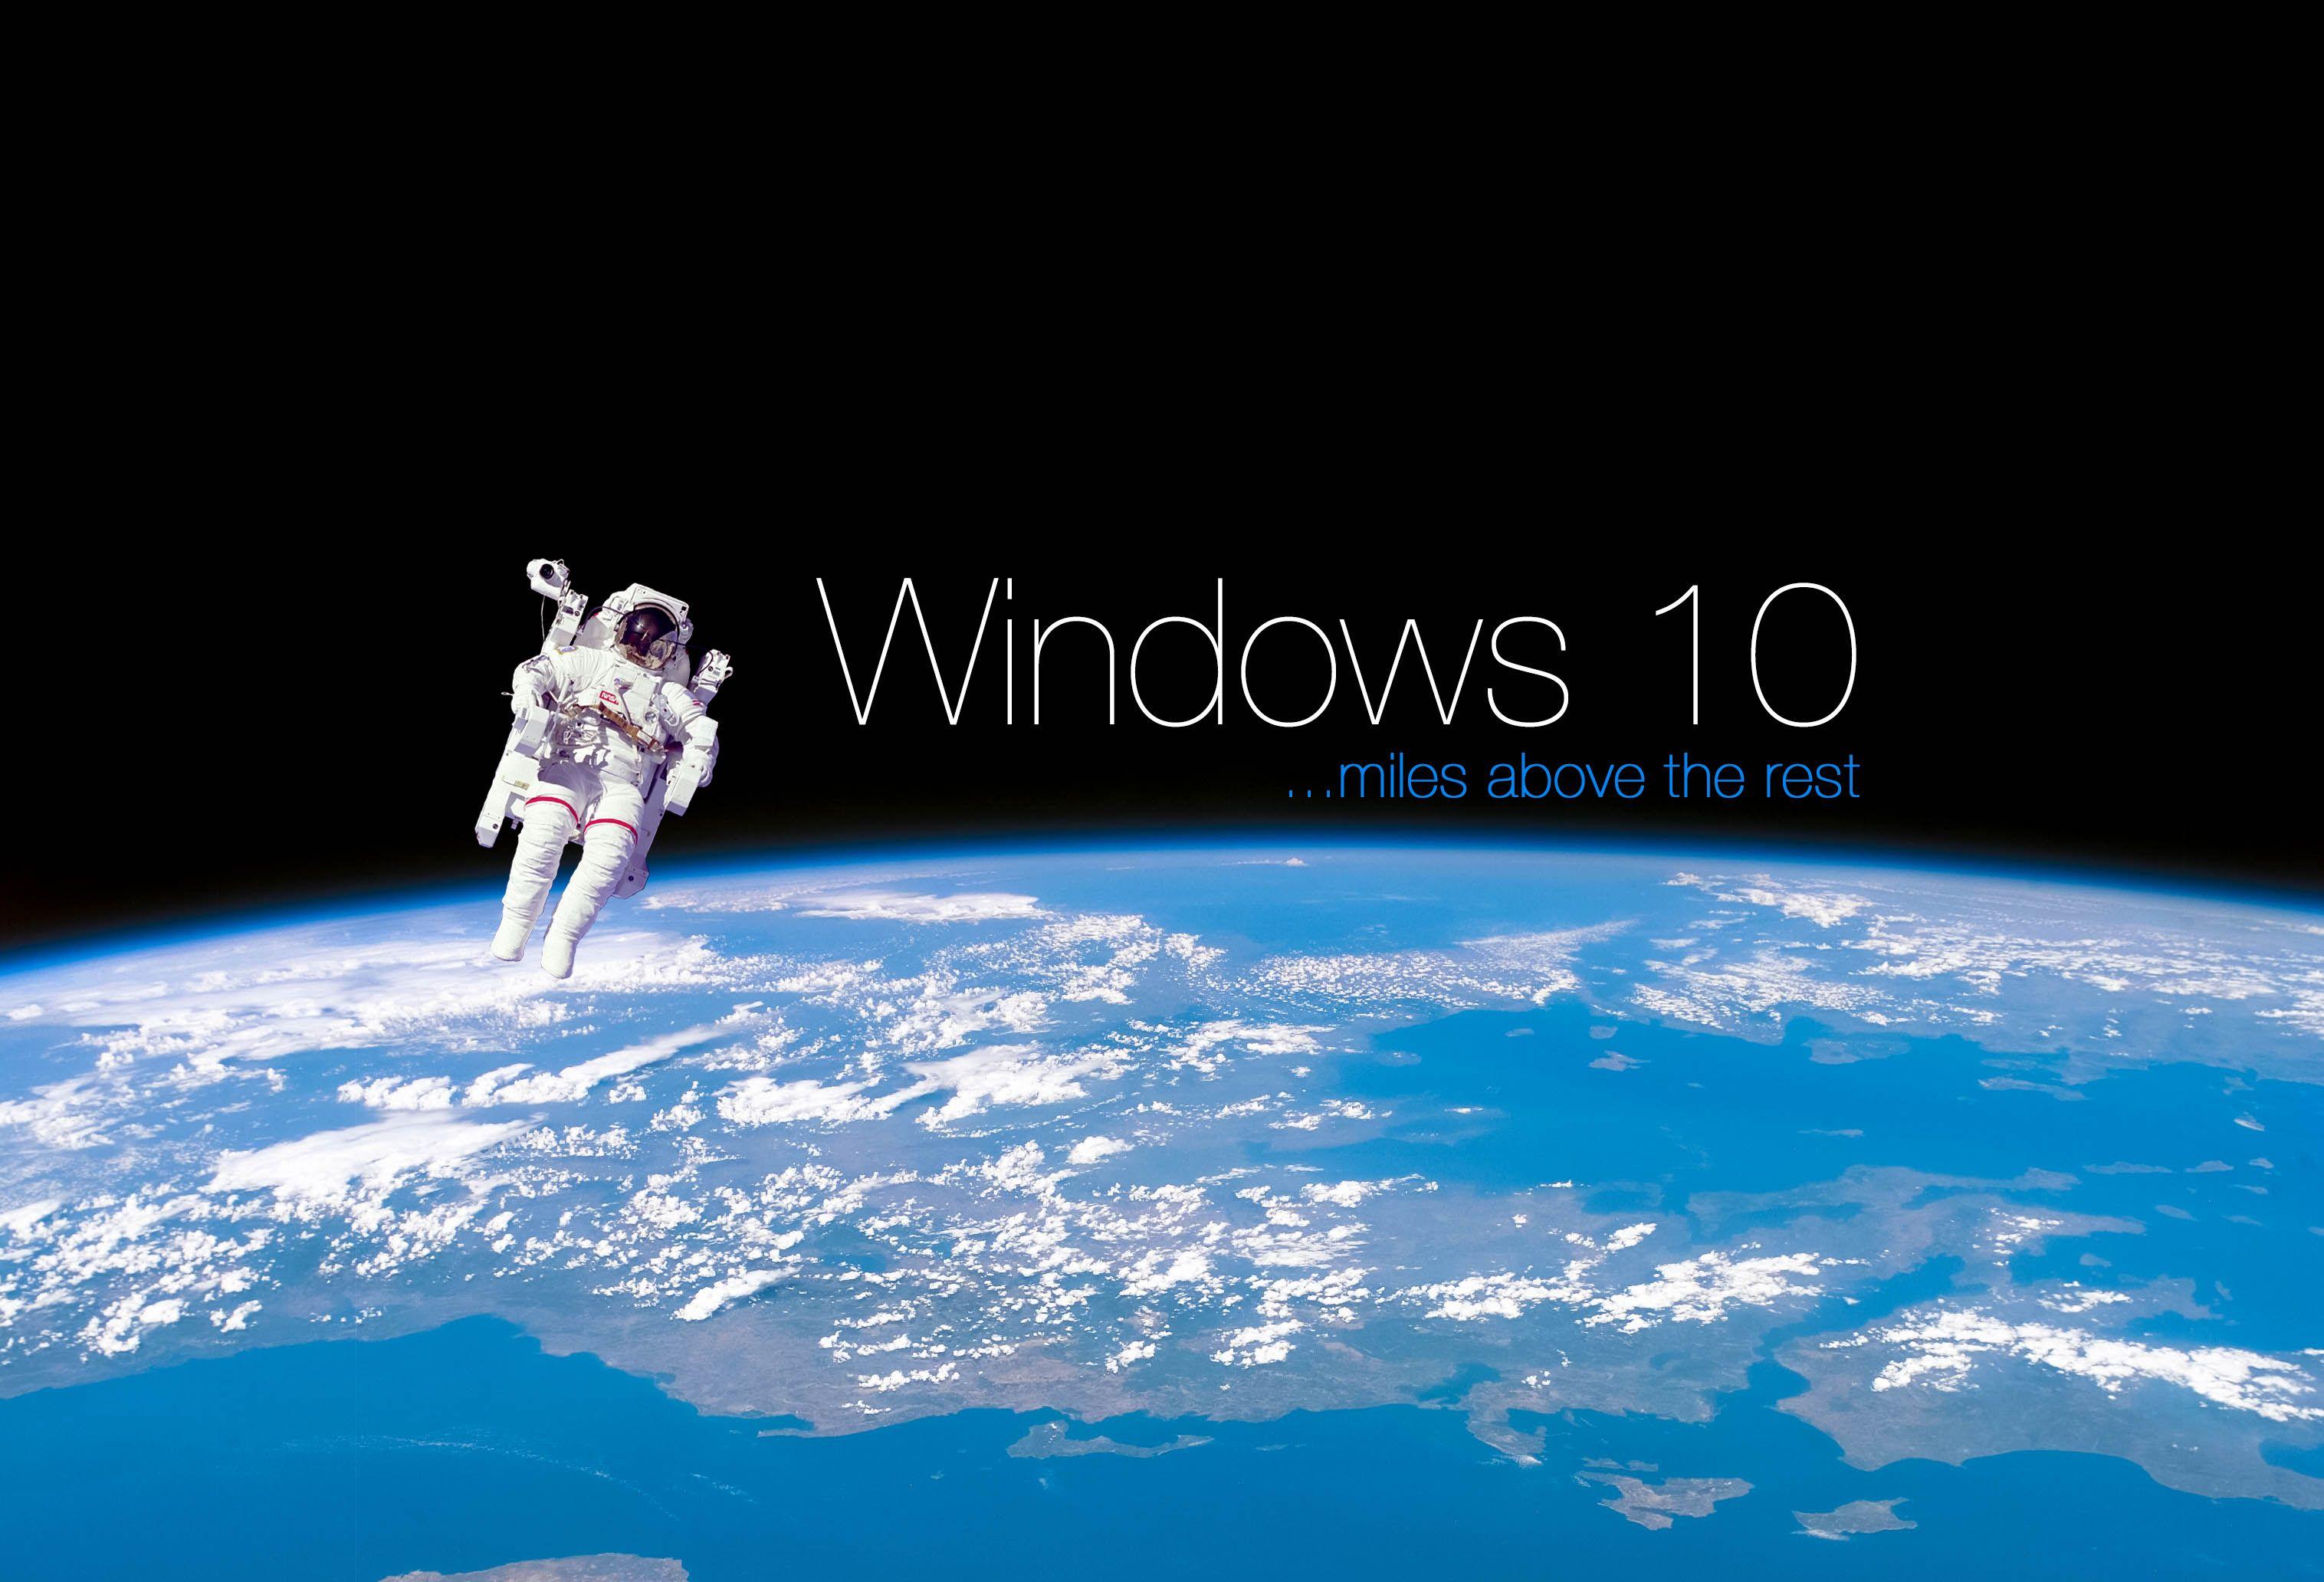 windows 10 wallpapers